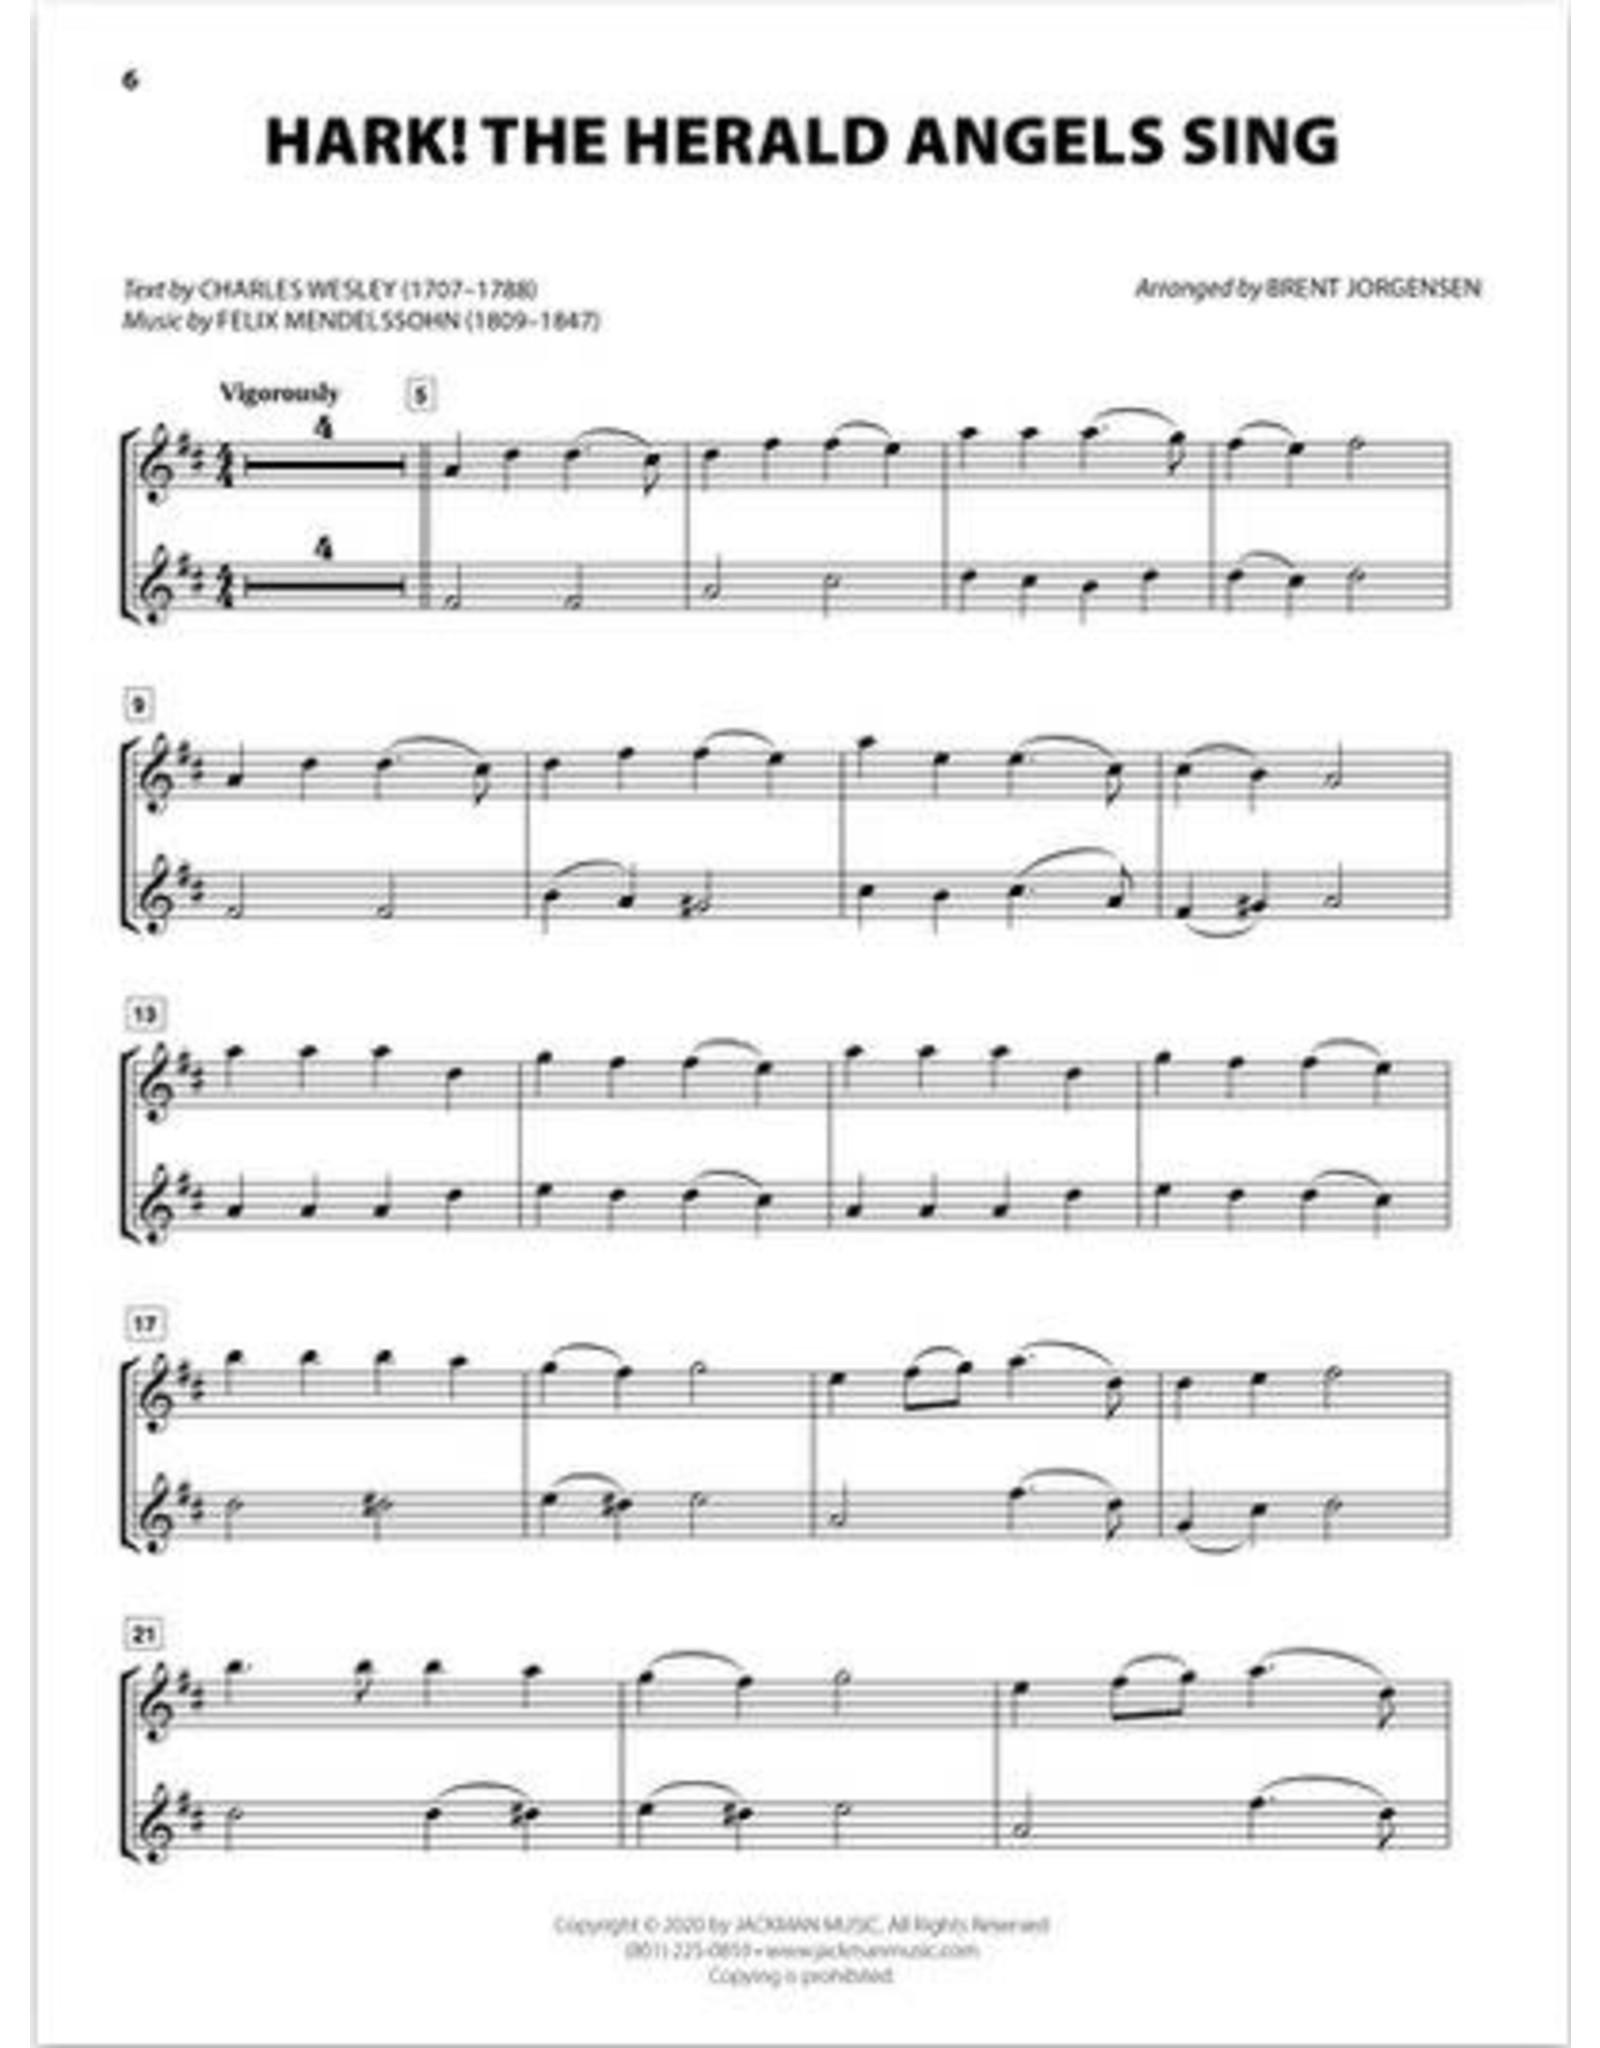 Jackman Music Christmas Hymn-Alongs - arr. Brent Jorgensen - Alto Saxophone